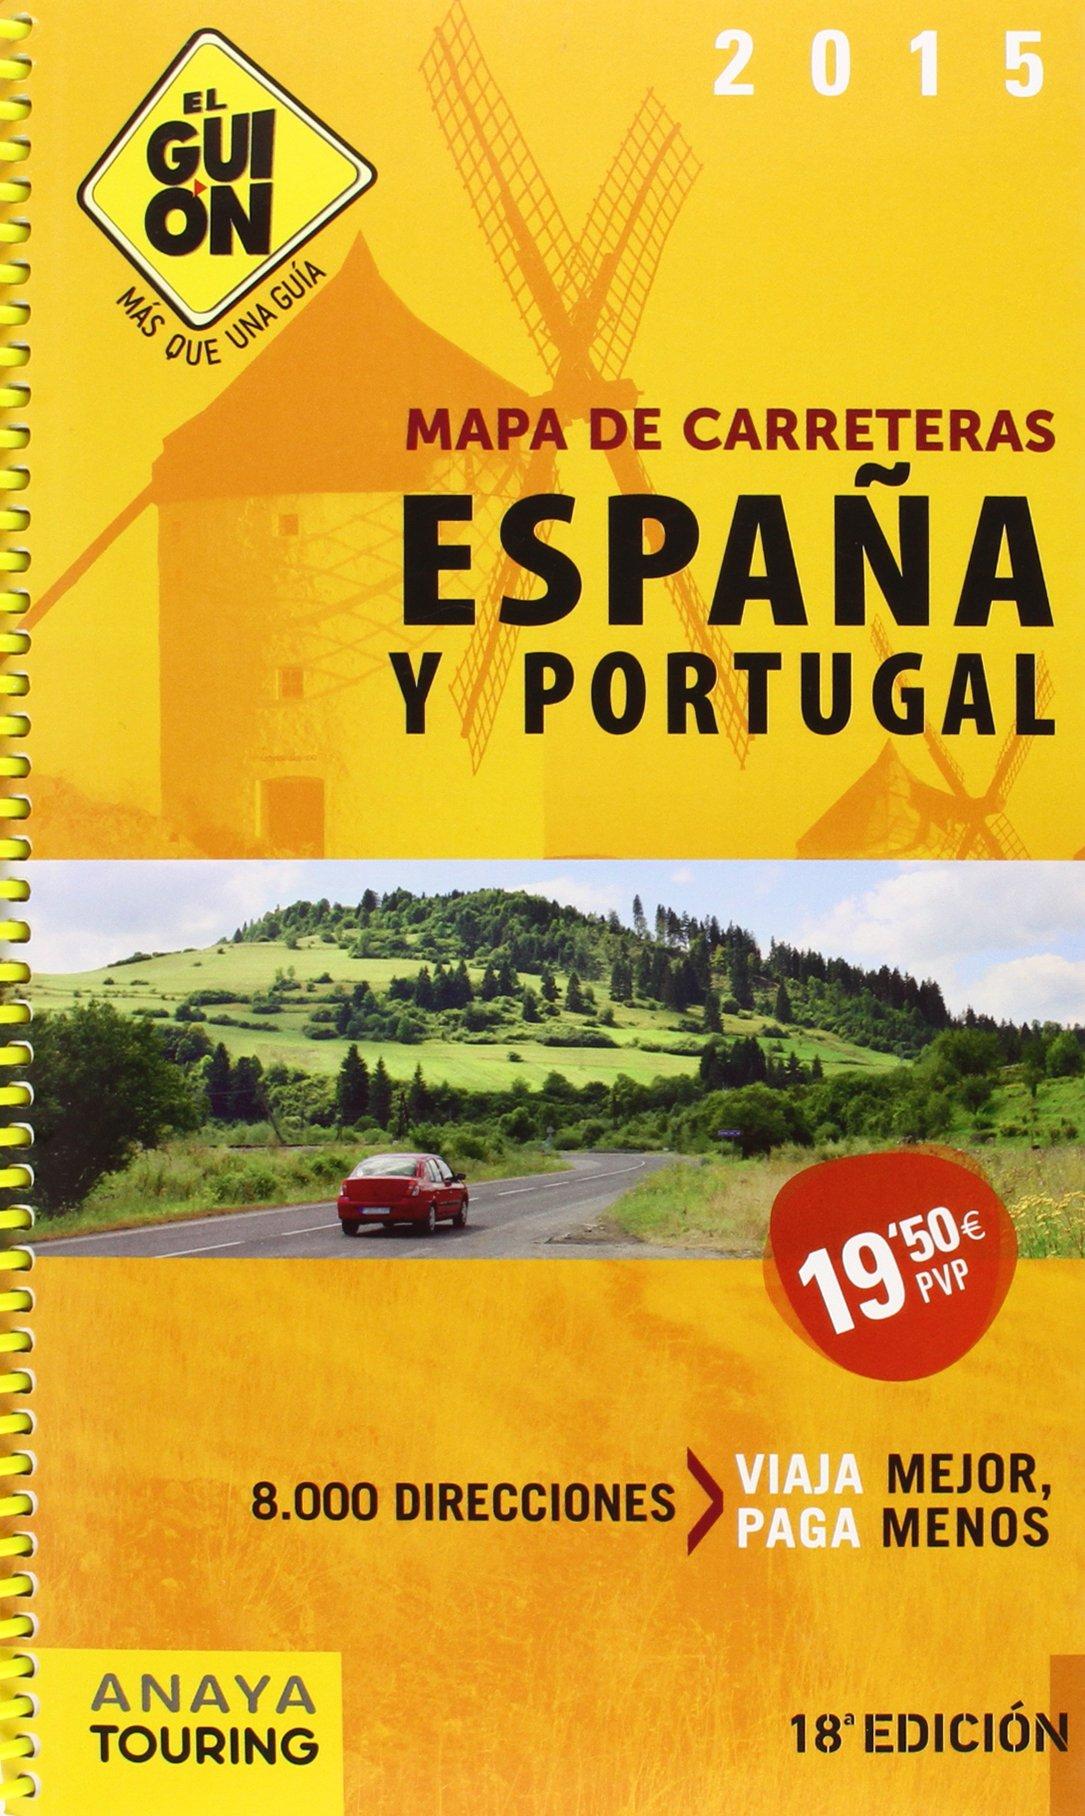 El Guion 2015 Spain And Porugal Roadmap Guide Mapa De